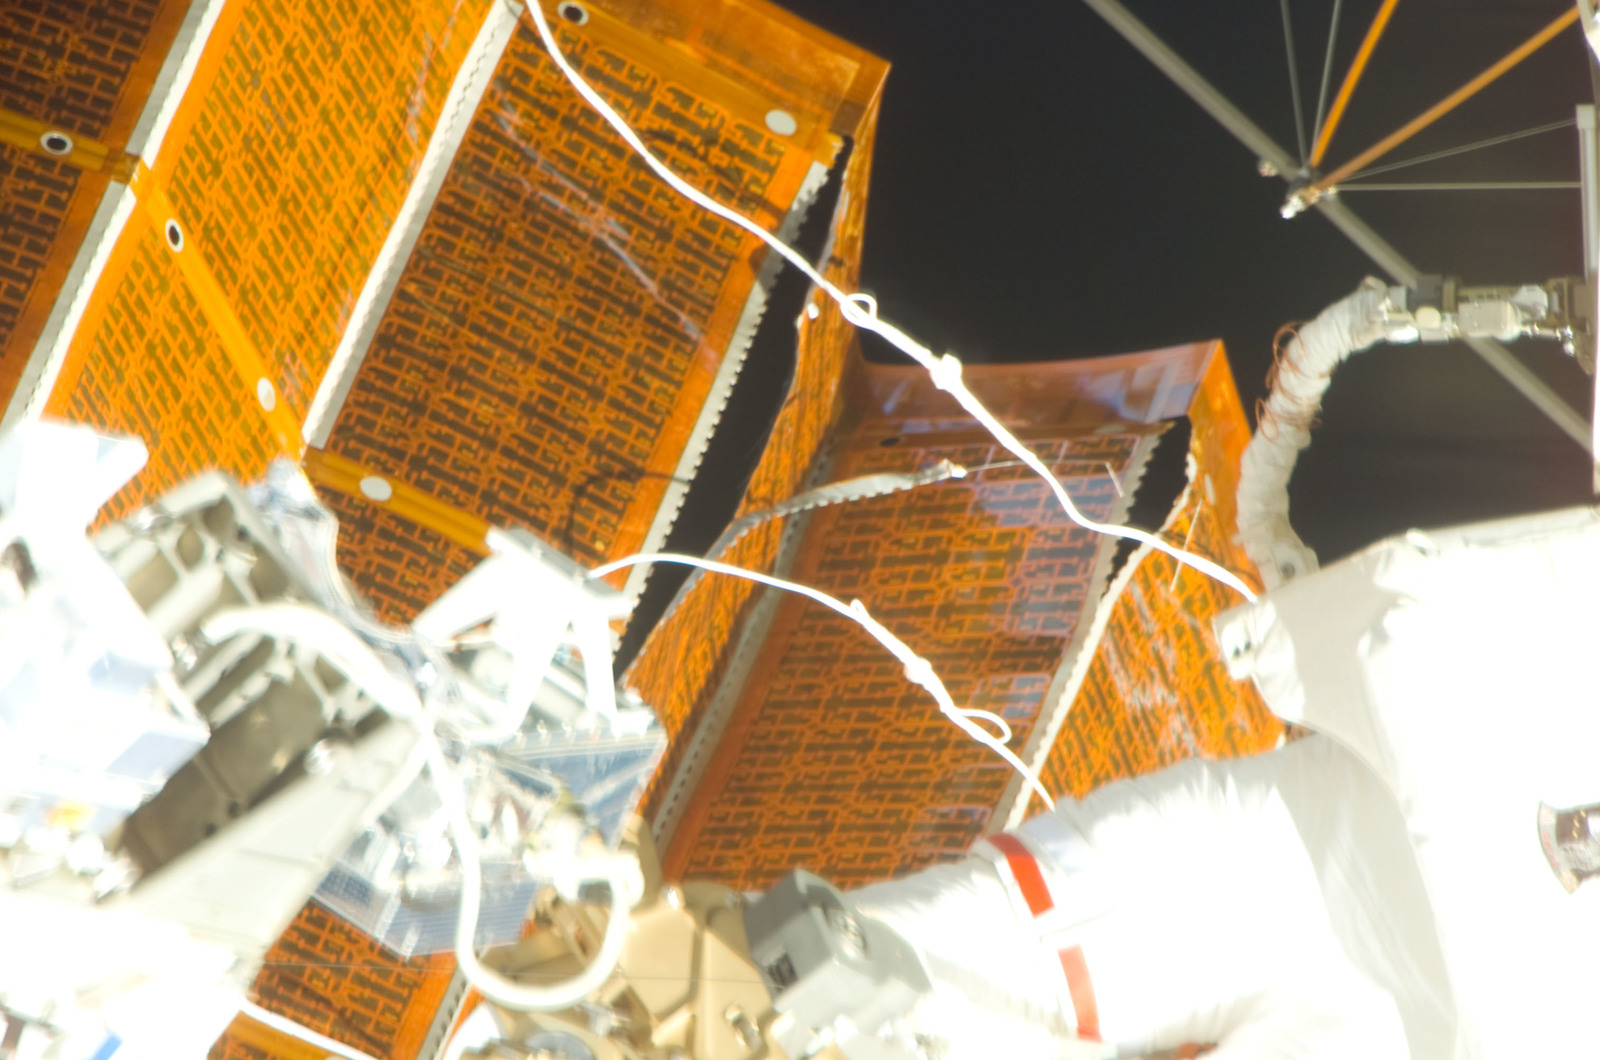 S120E008408 - STS-120 - EVA 4 - P6 4B solar array repair